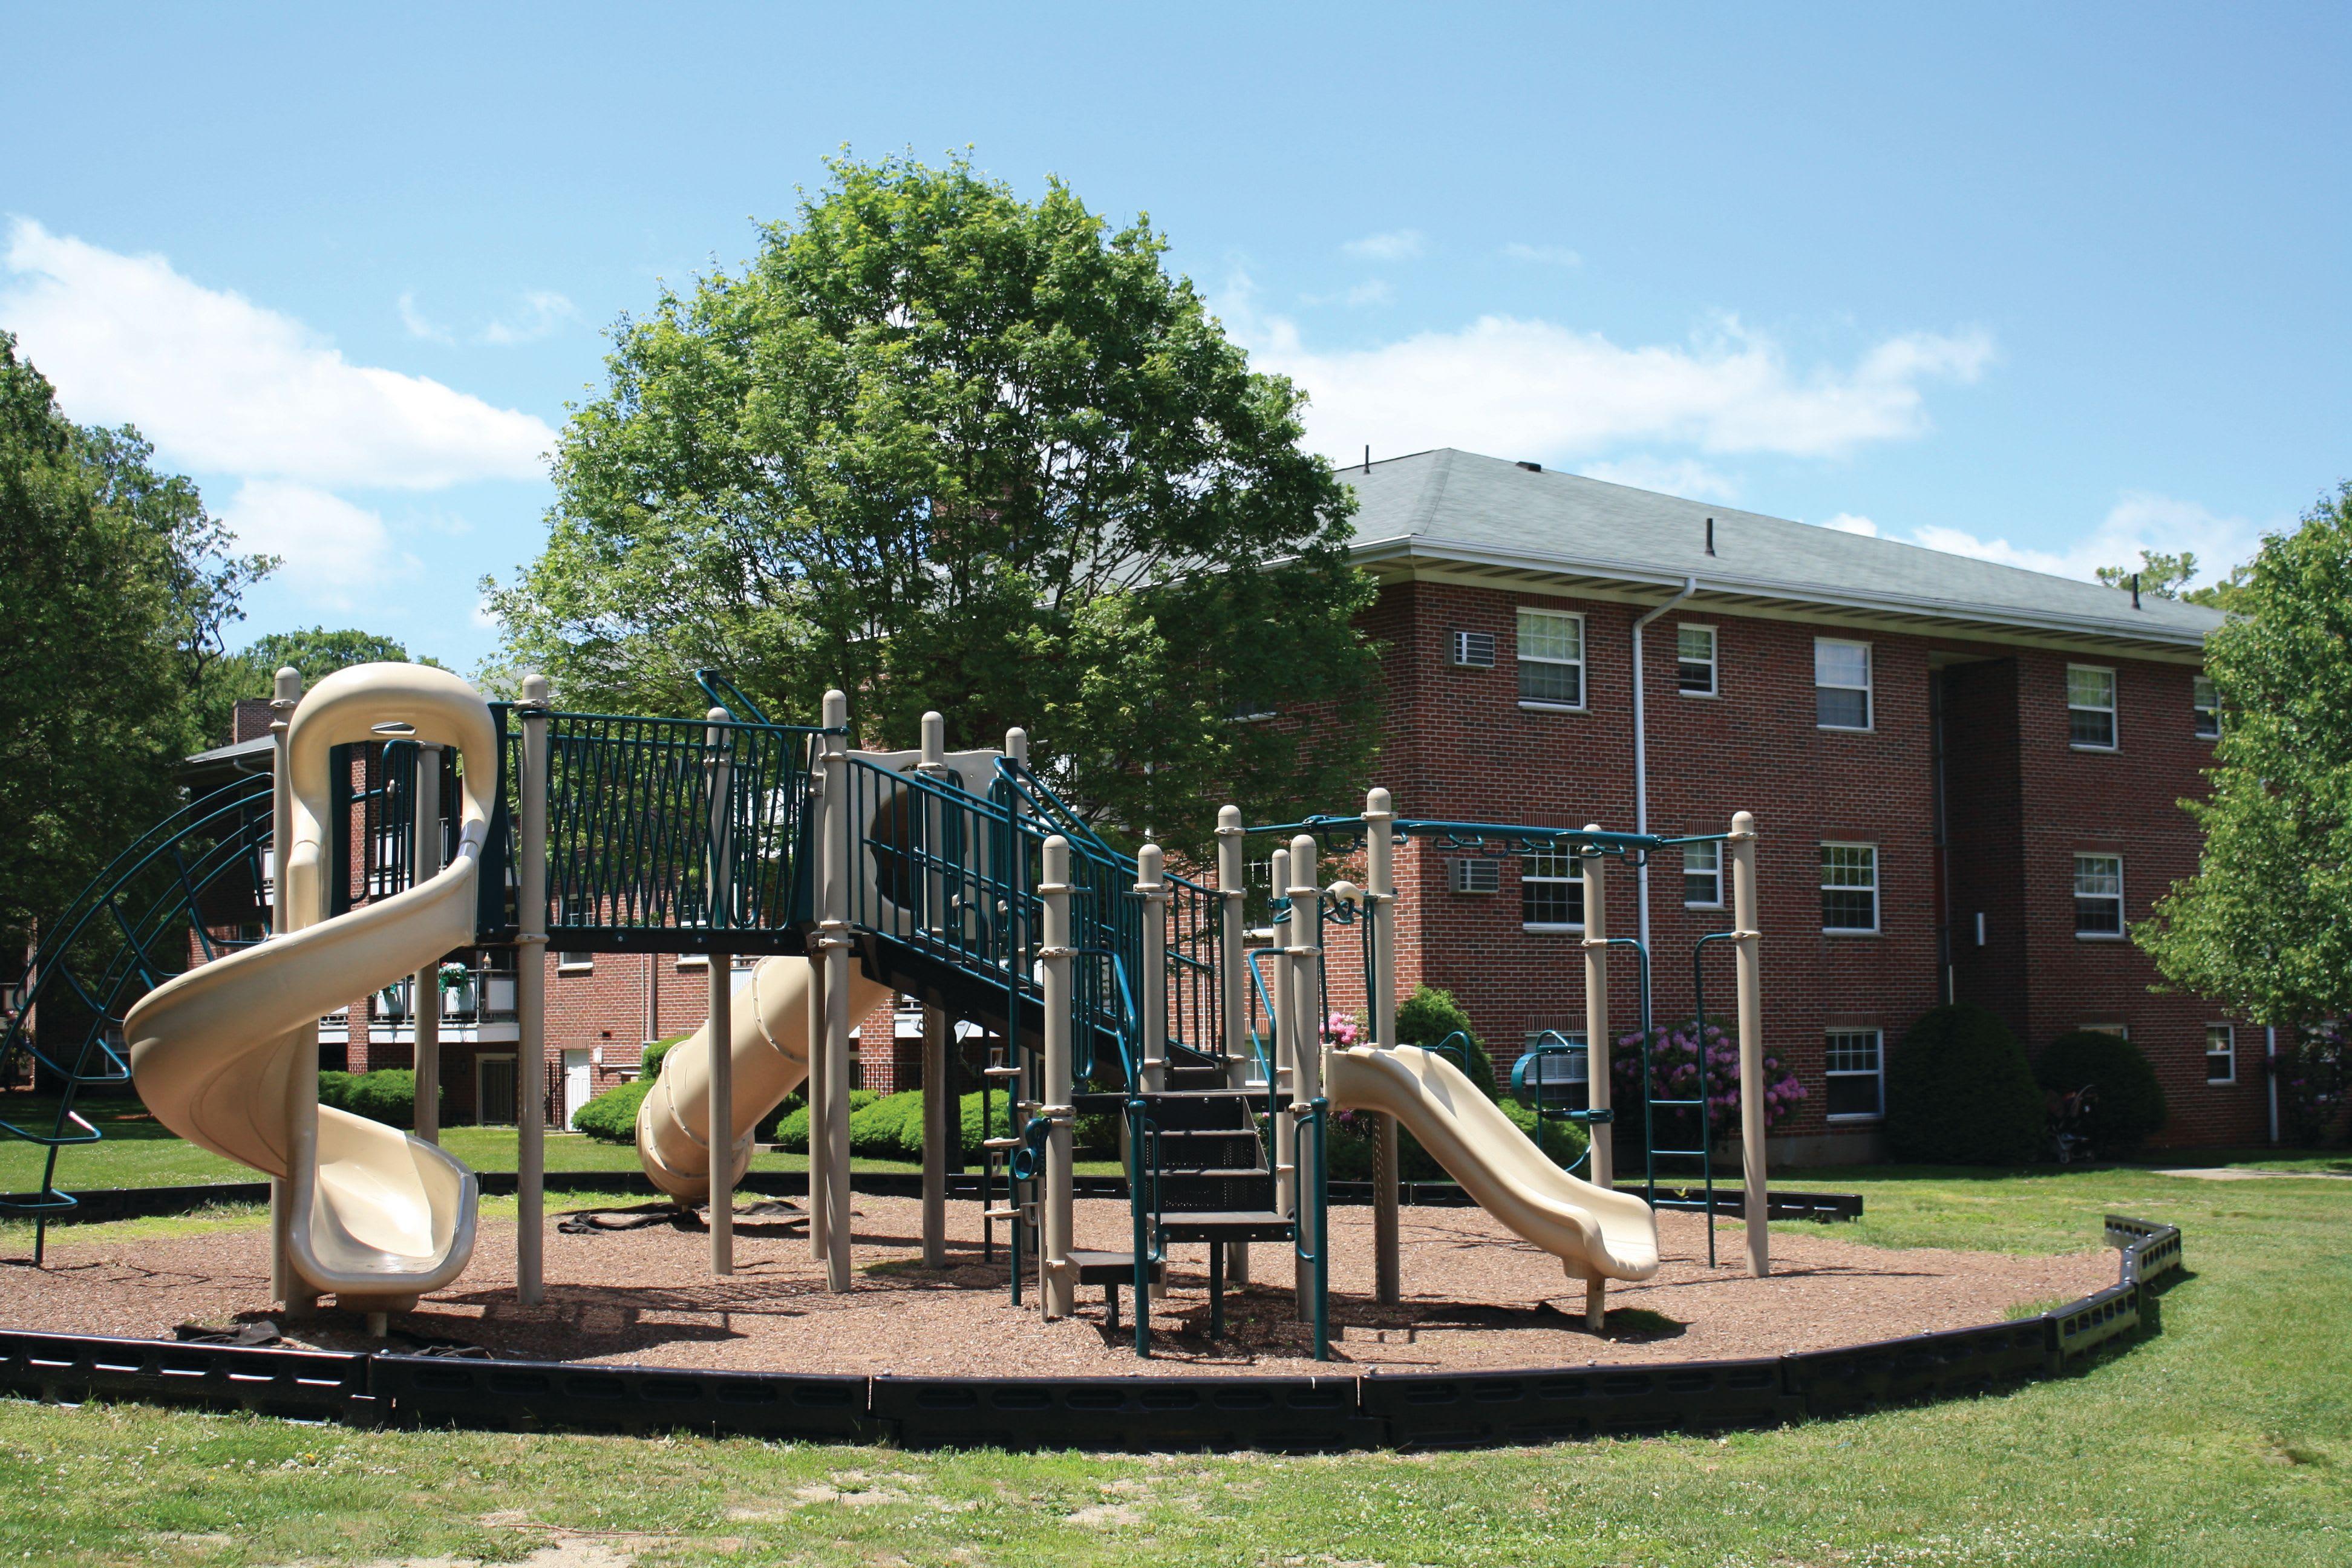 Playground at Gardencrest in Waltham, Massachusetts